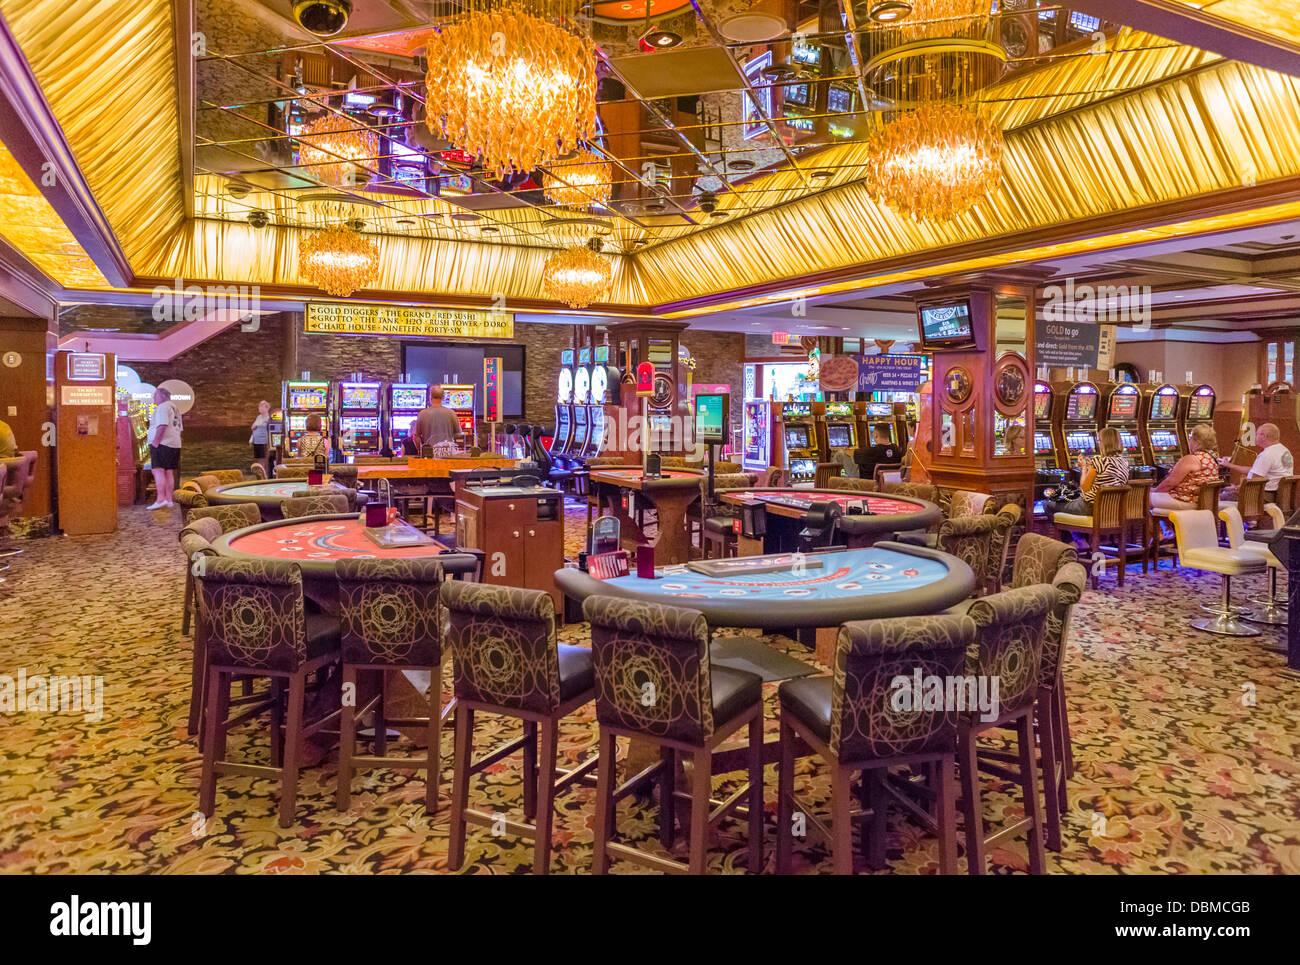 Fremont Hotel & Casino Las Vegas Nv